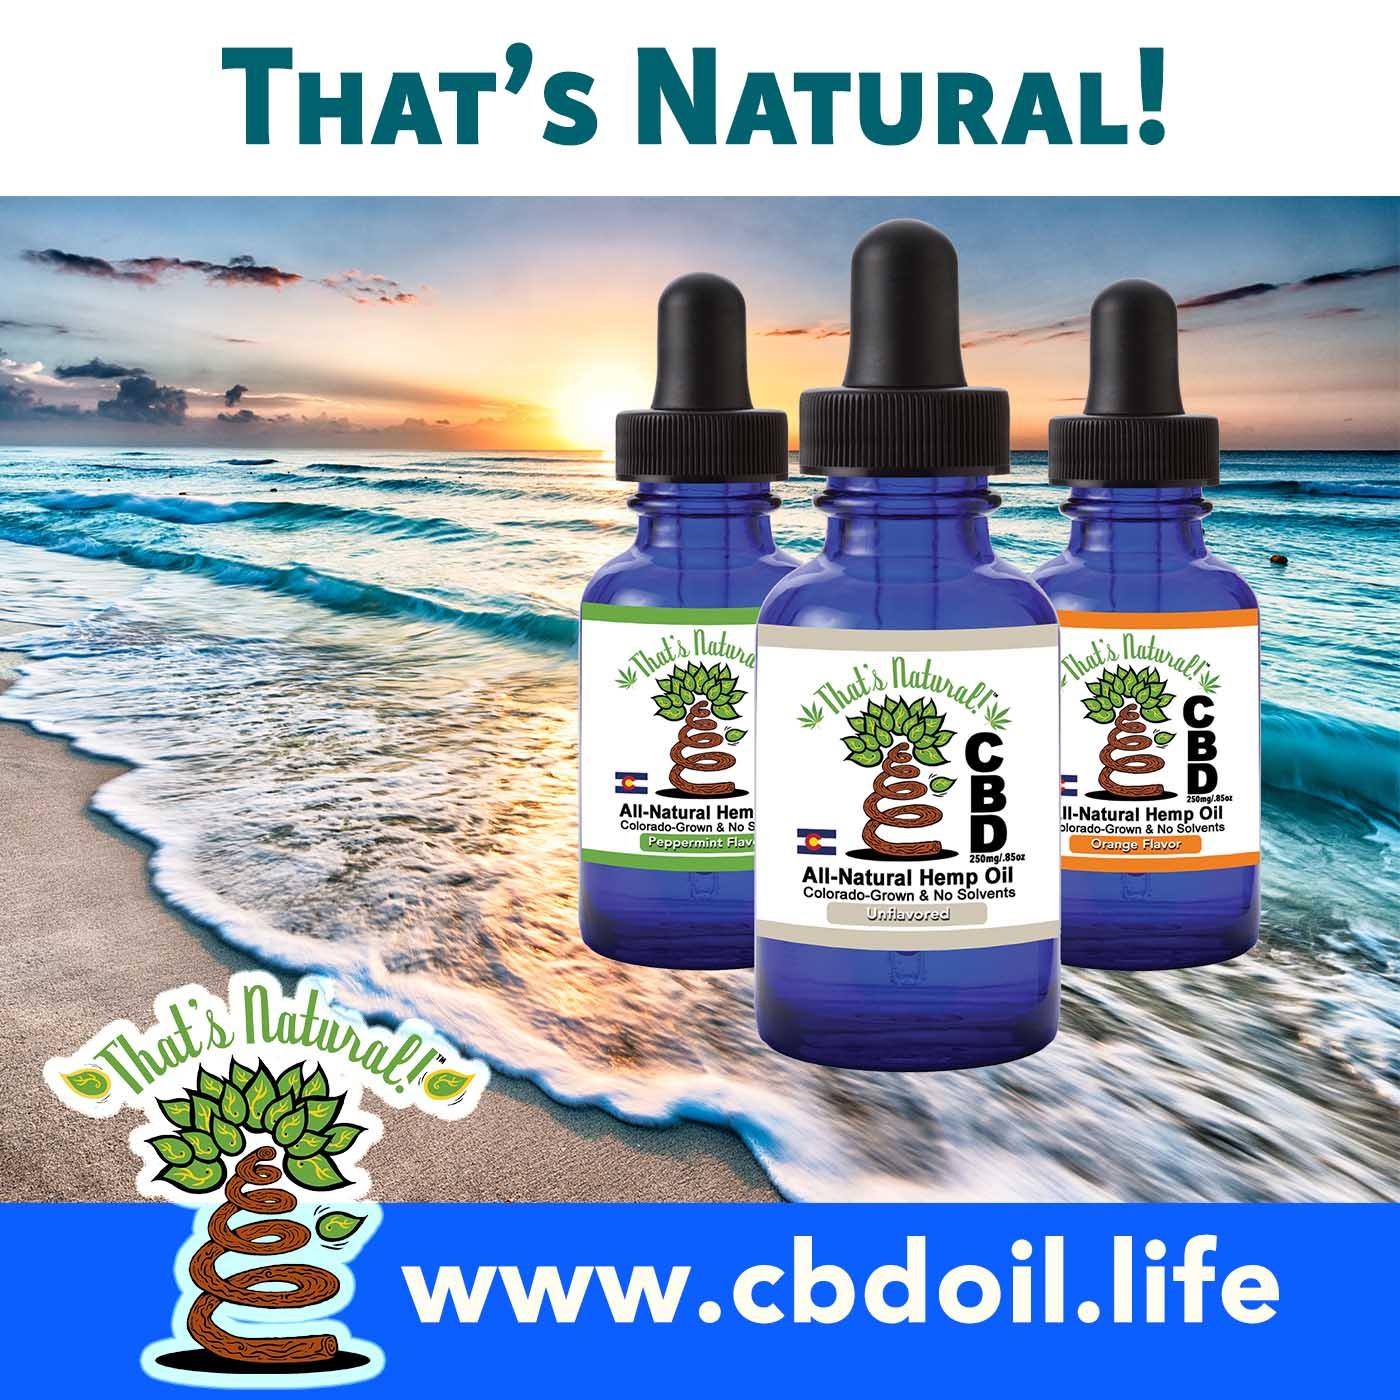 That's Natural Full Spectrum CBD Oil with 3 Bottles and Ocean Background, V1